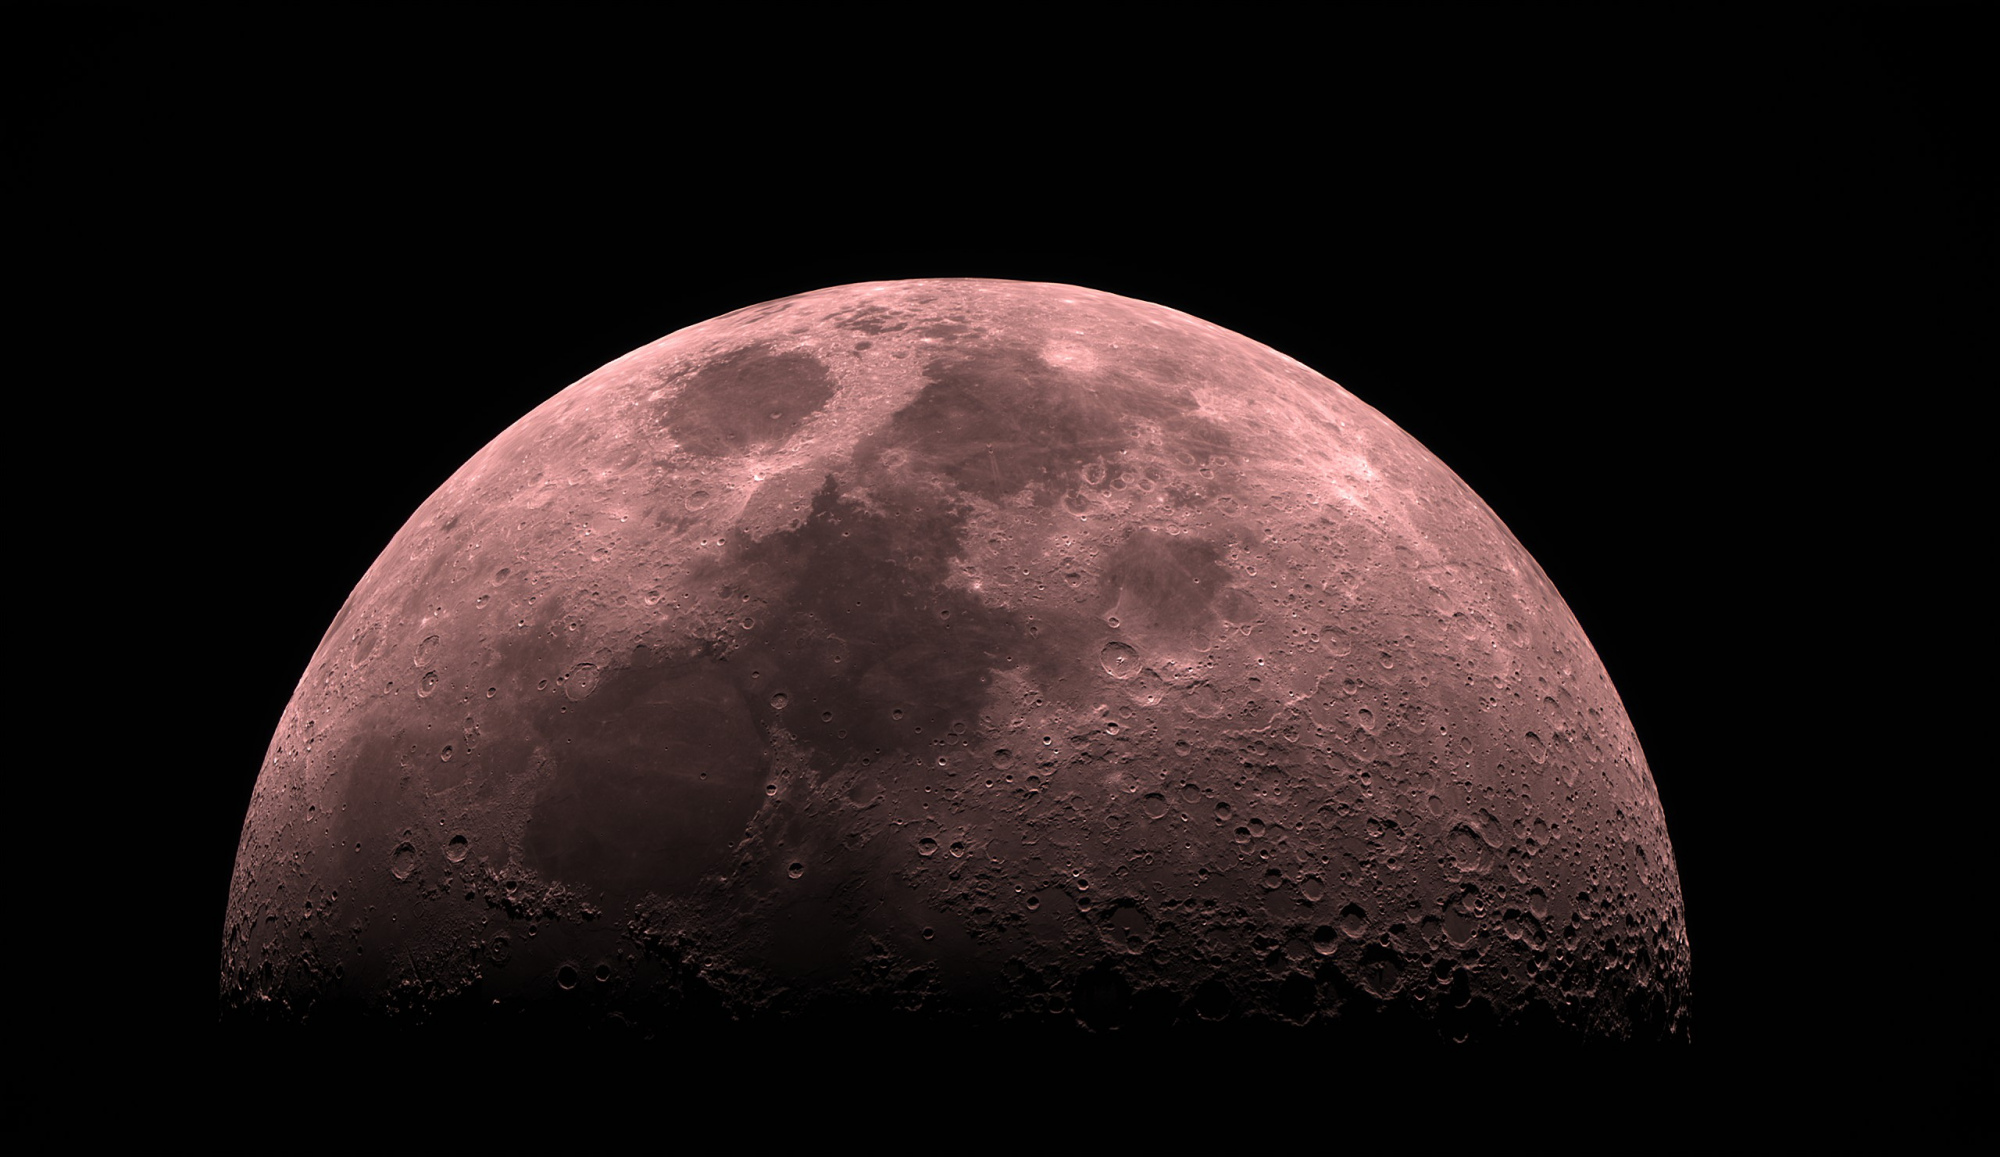 Moon_190141_g4_ap5372_2.thumb.jpg.de379279474e1c1afd41c44c19df2248.jpg